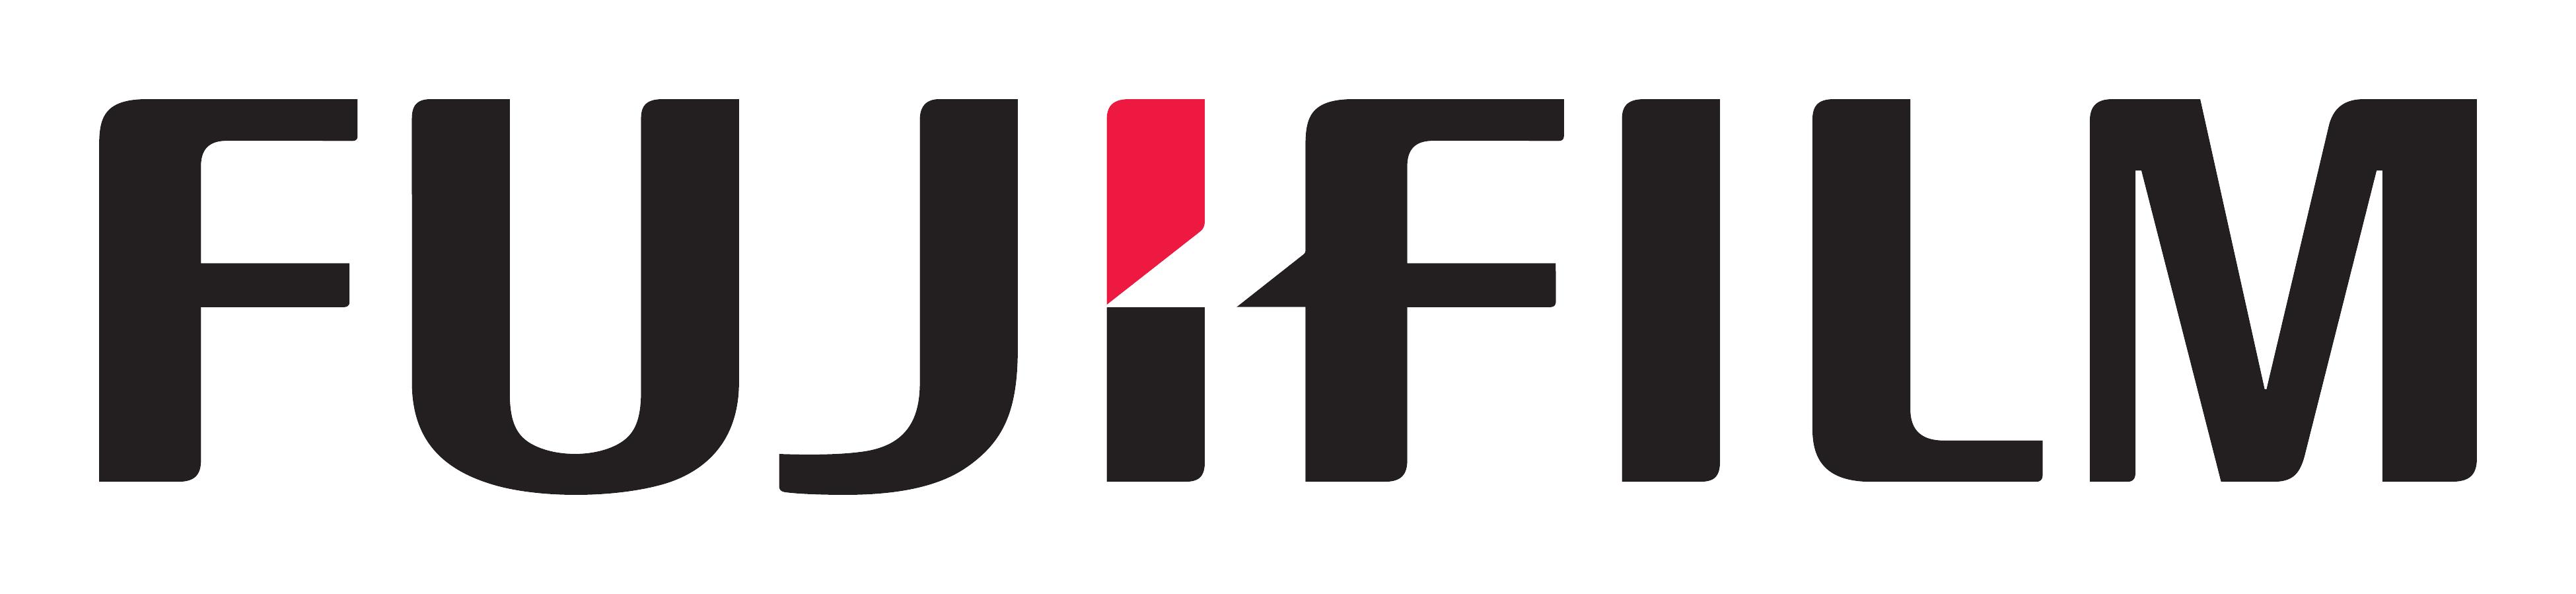 Fujifilm logo wallpapers HD